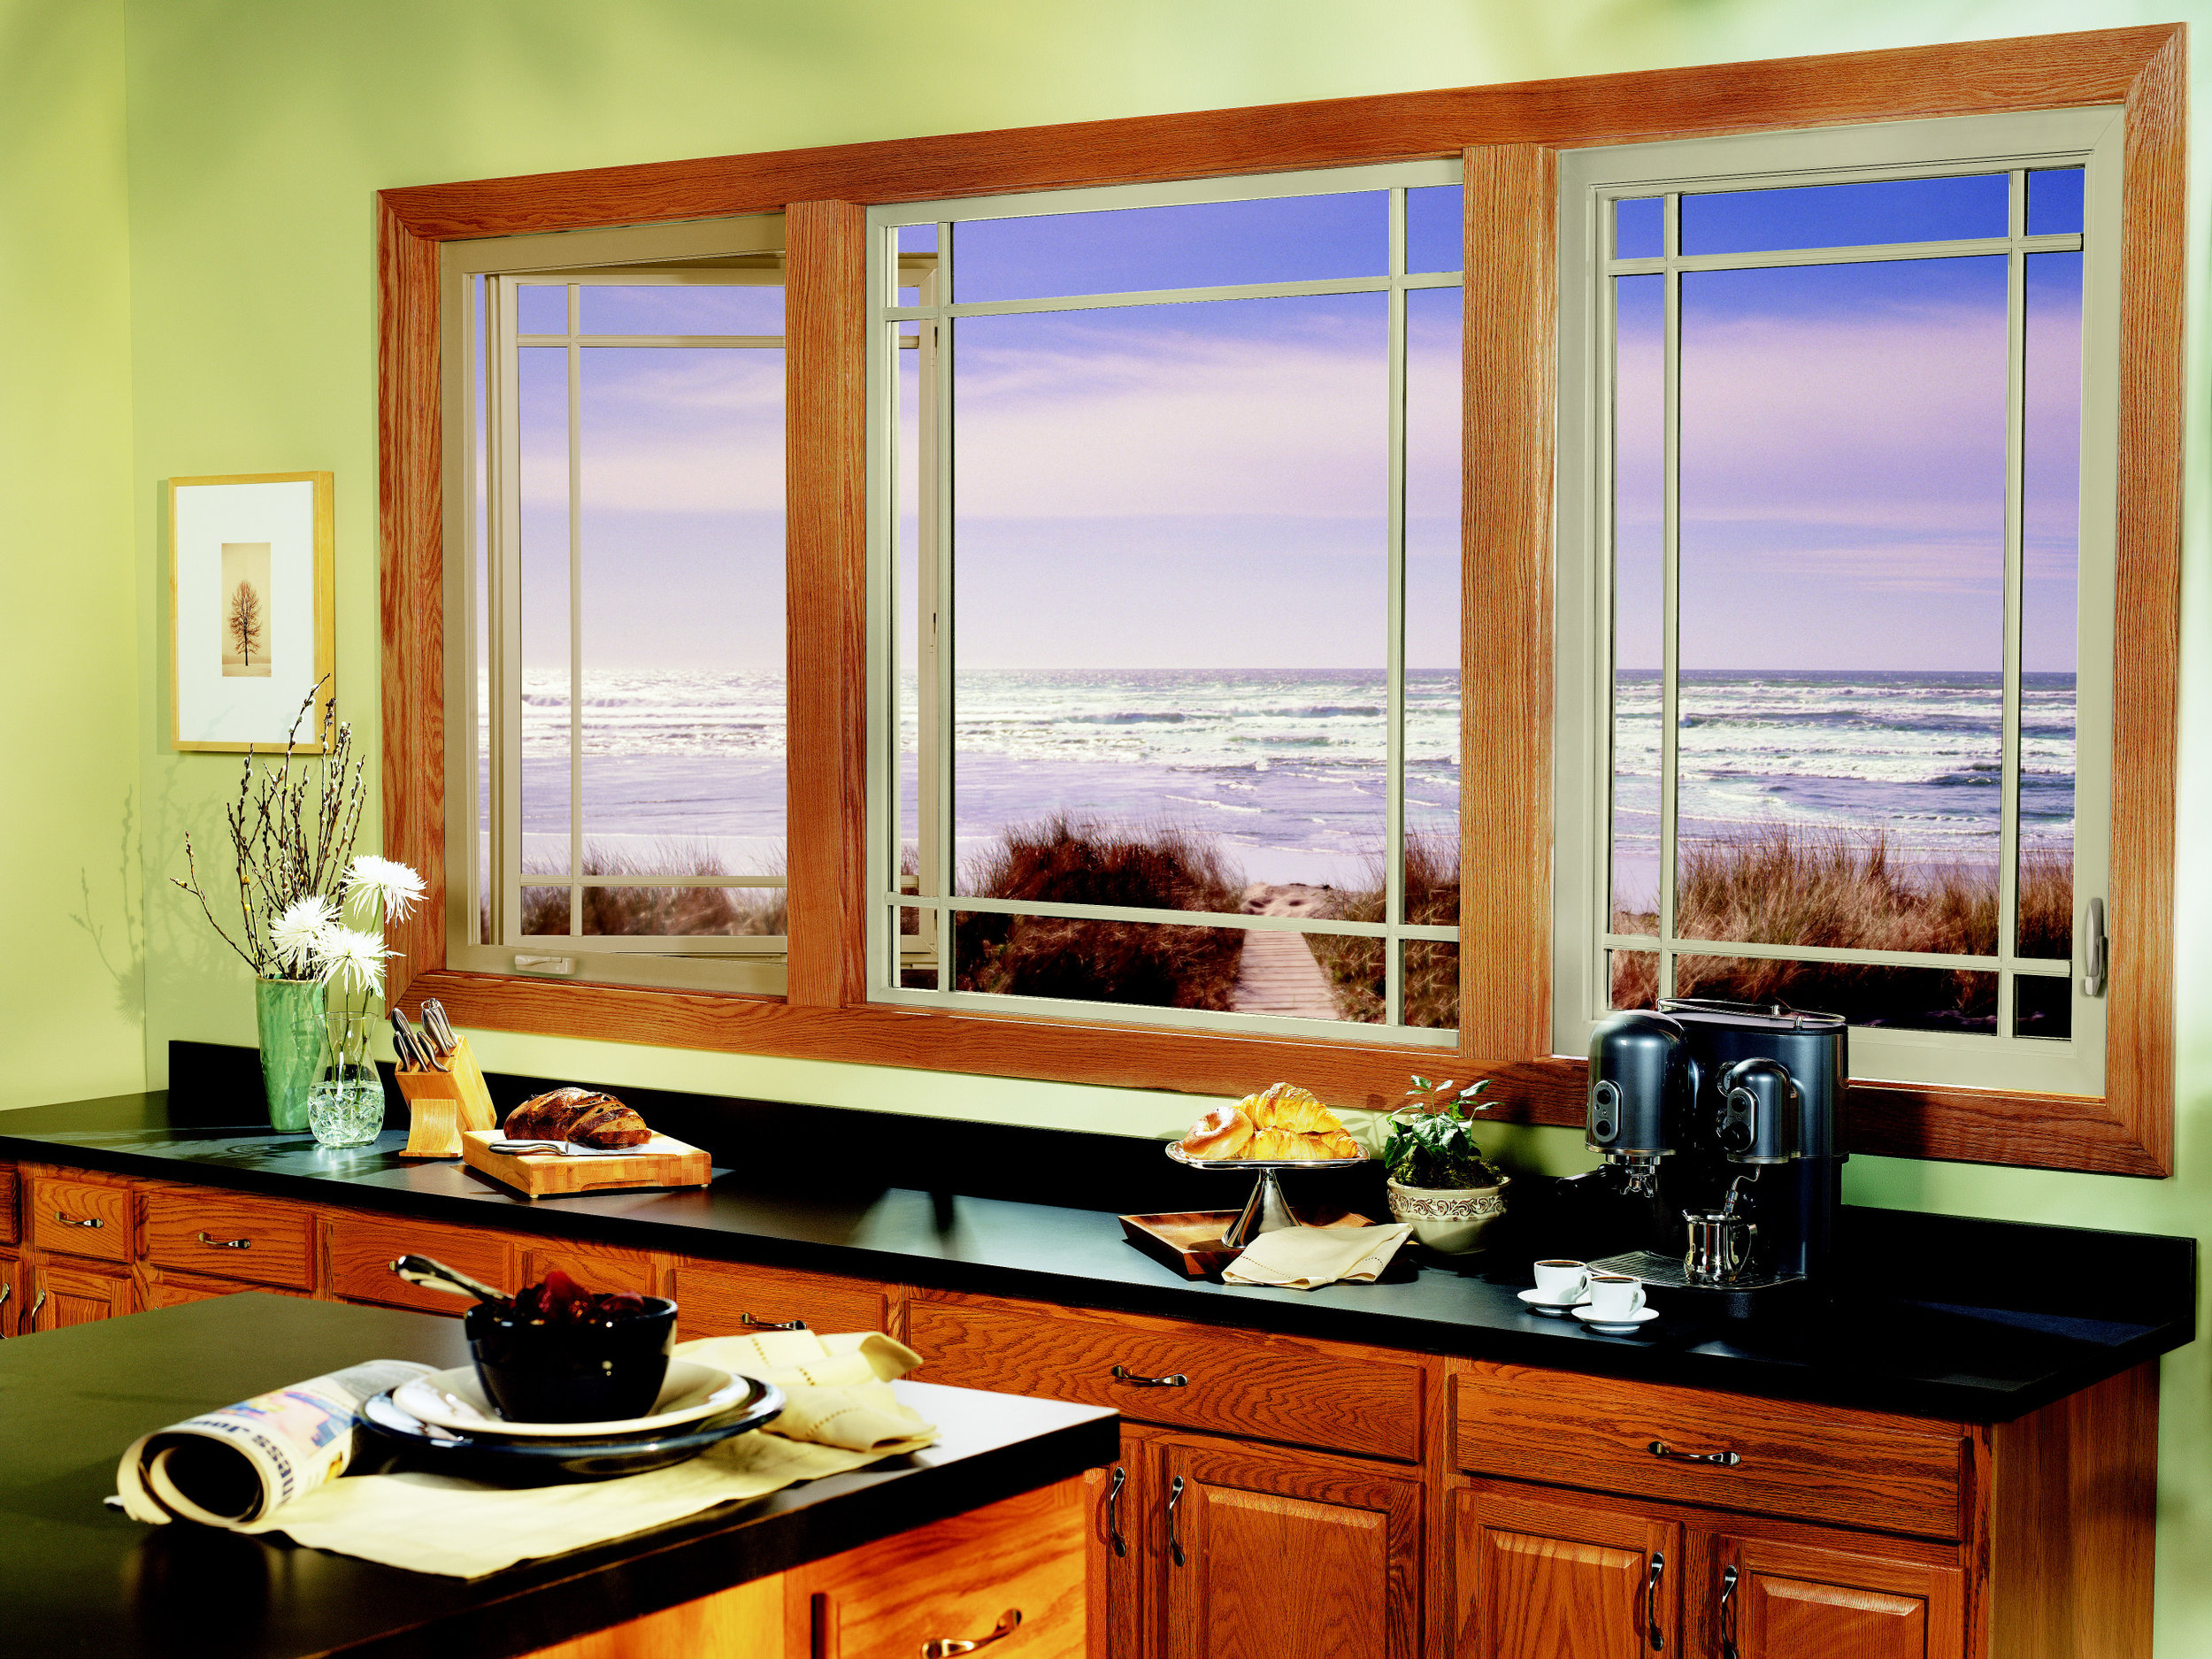 repair-replace-windows-doors-4.jpg